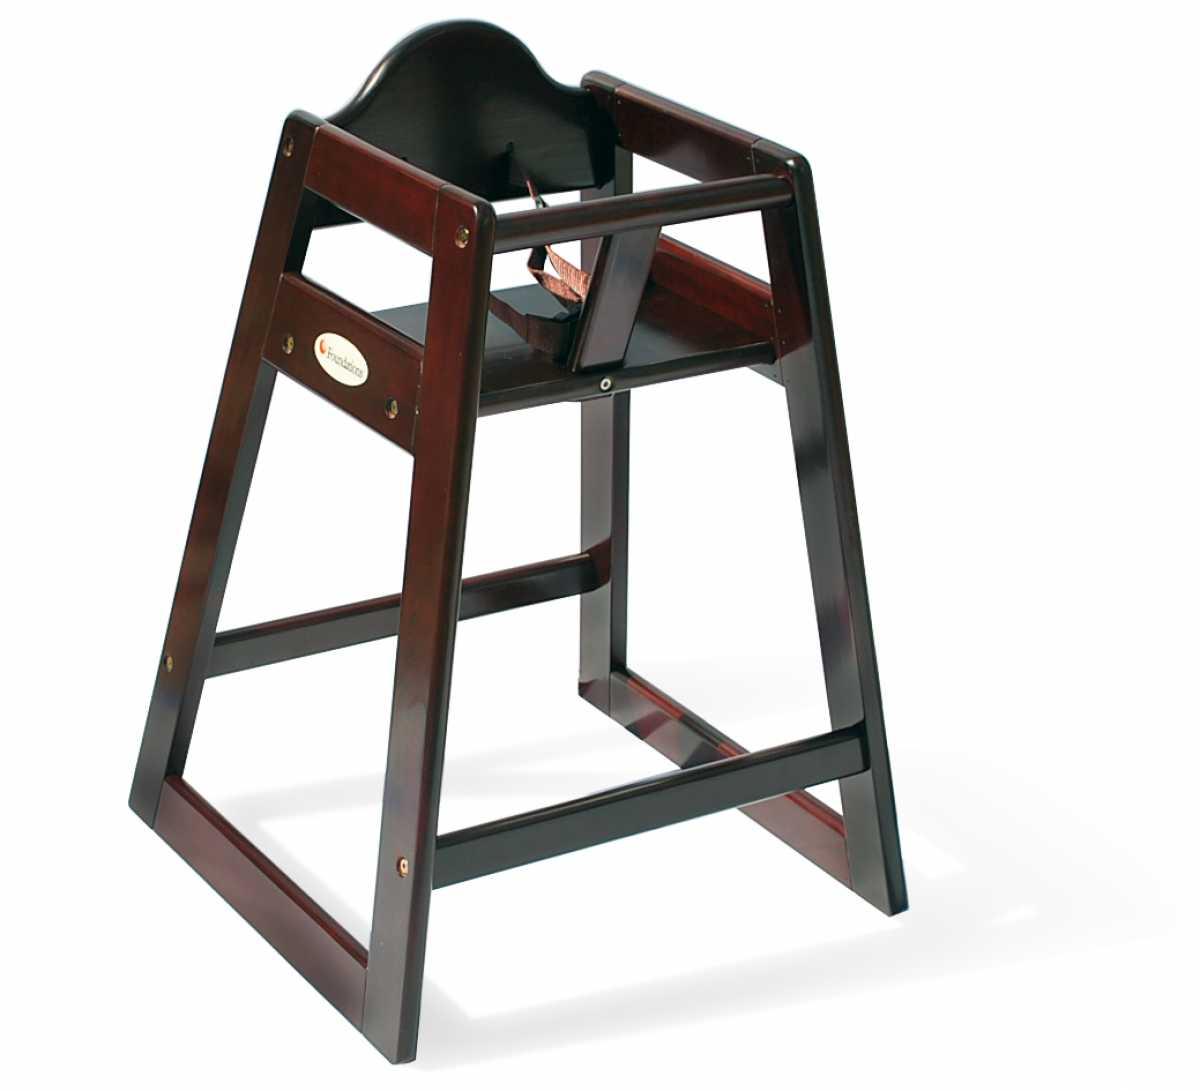 FOUNDATIONS Mama Sandalyesi, Antik Vişne